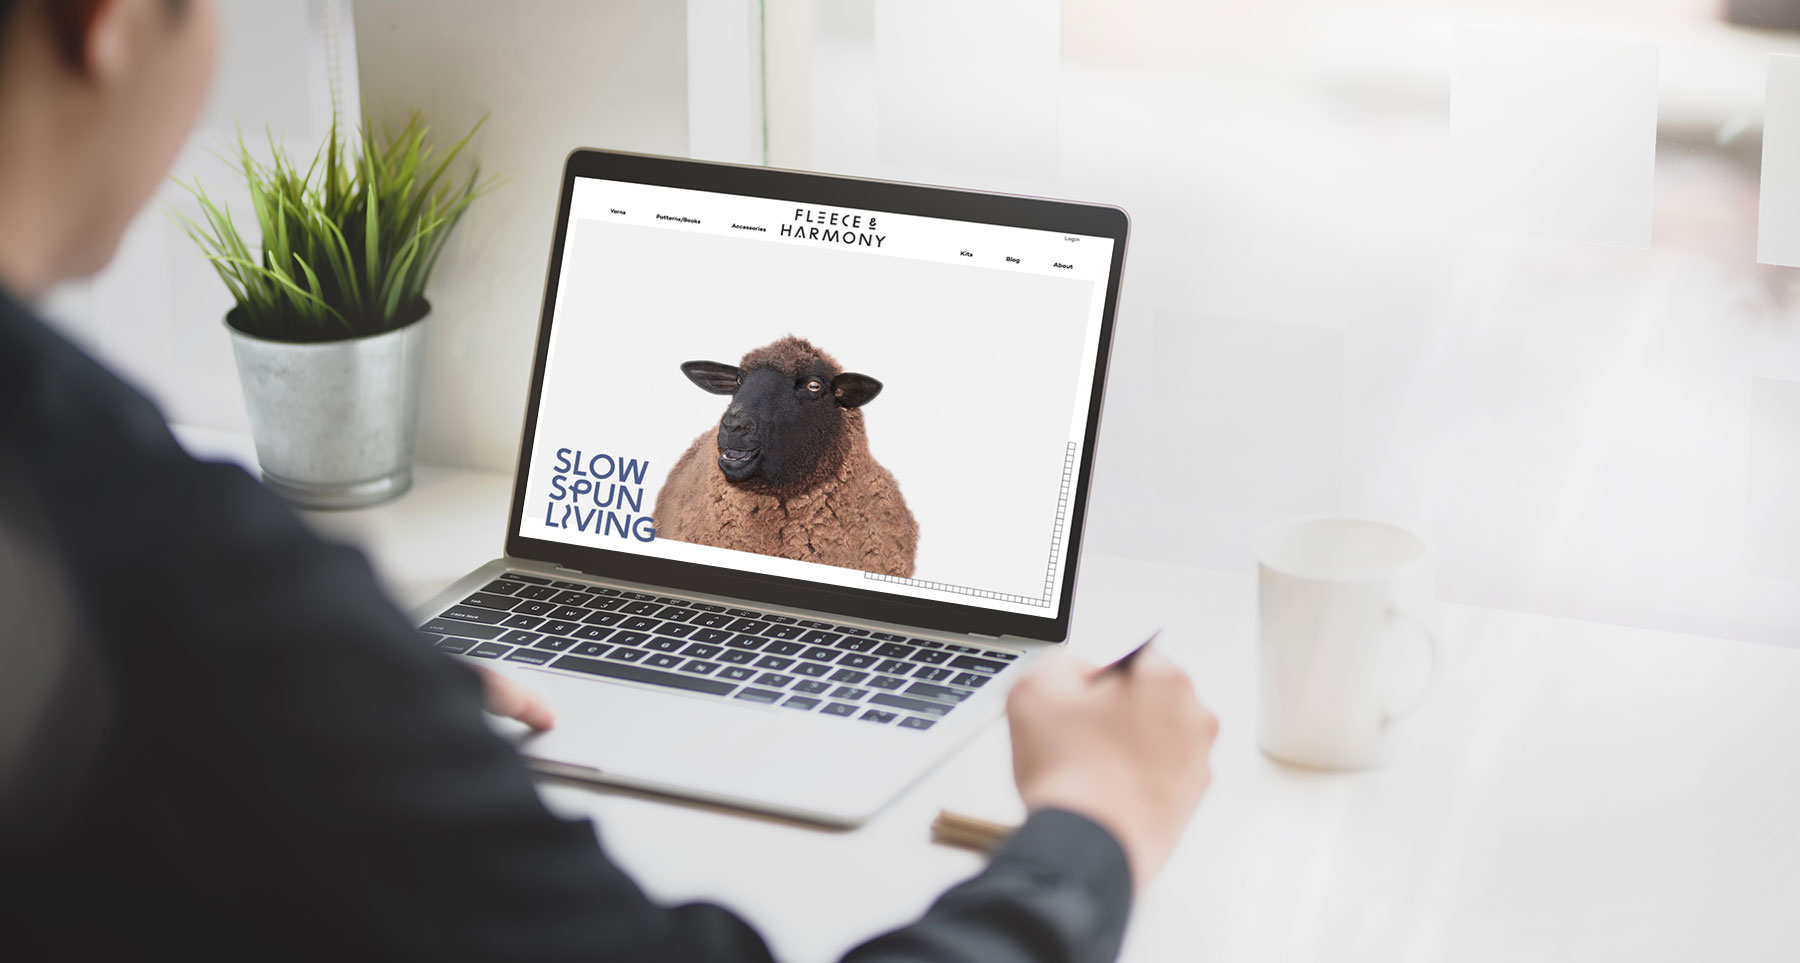 Fleece & Harmony Website